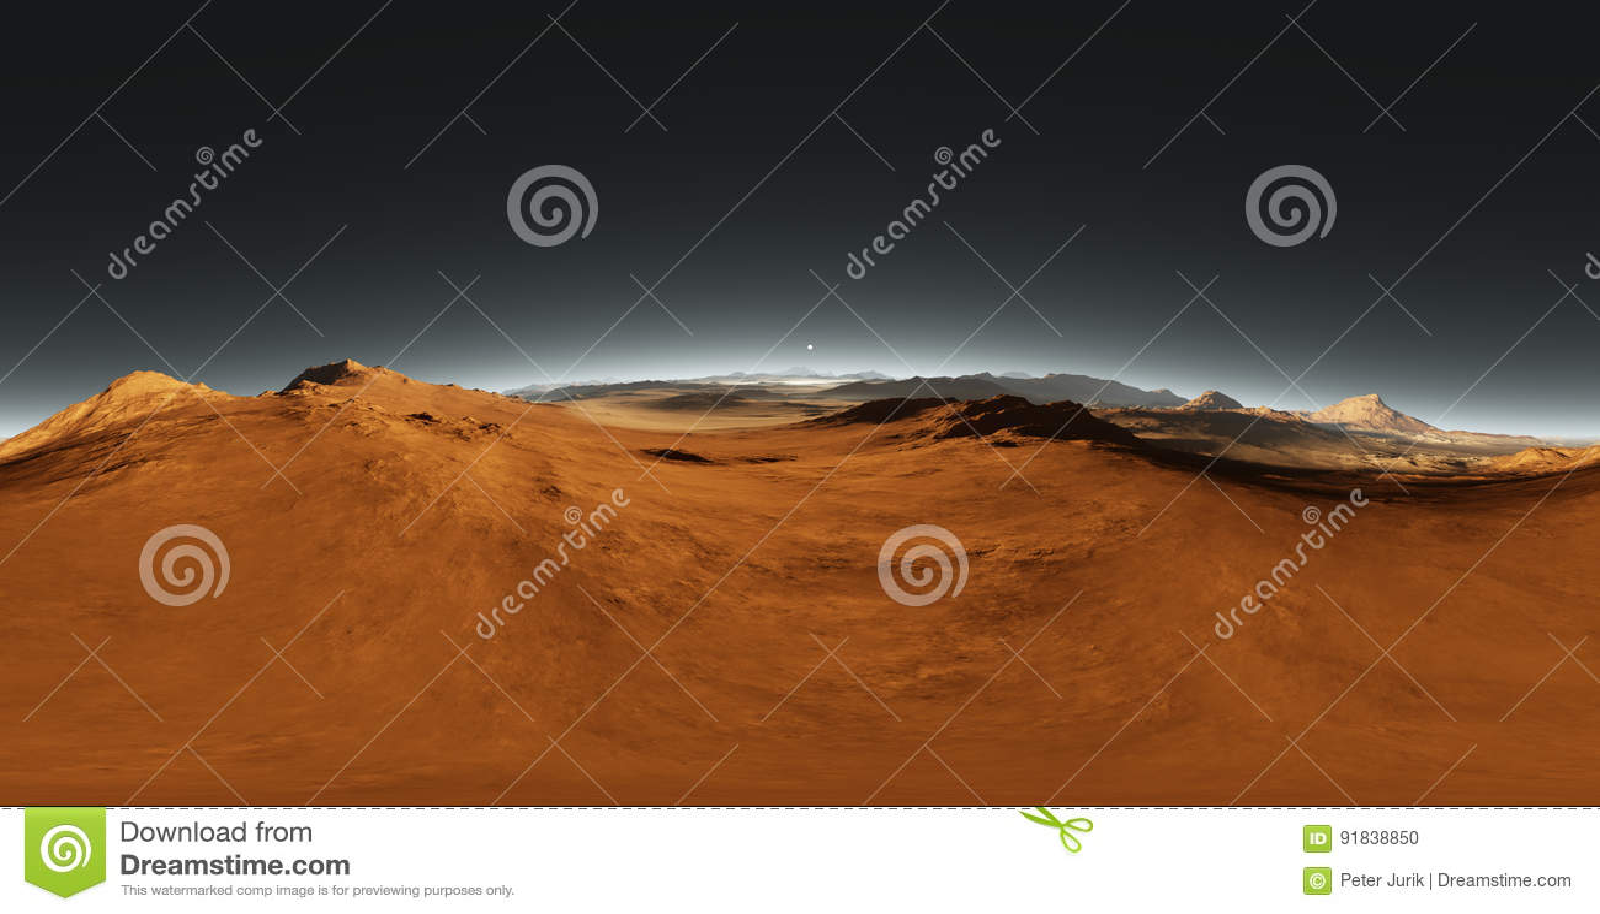 Панорама захода солнца Марса, карты окружающей среды HDRI Проекция Equirectangular, сферически панорама Марсианский ландшафт